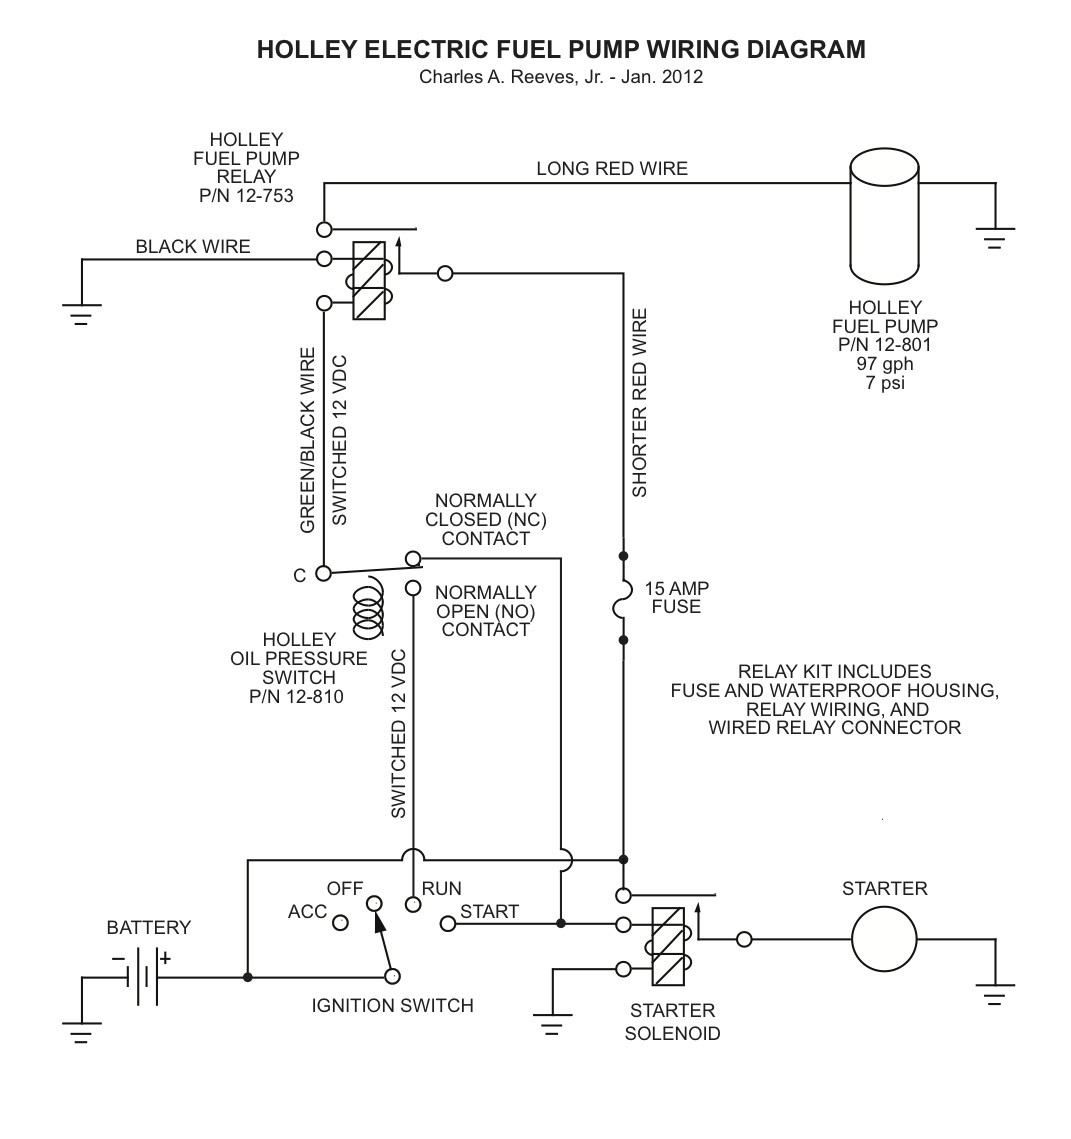 Delphi Fuel Pump Wiring Diagram